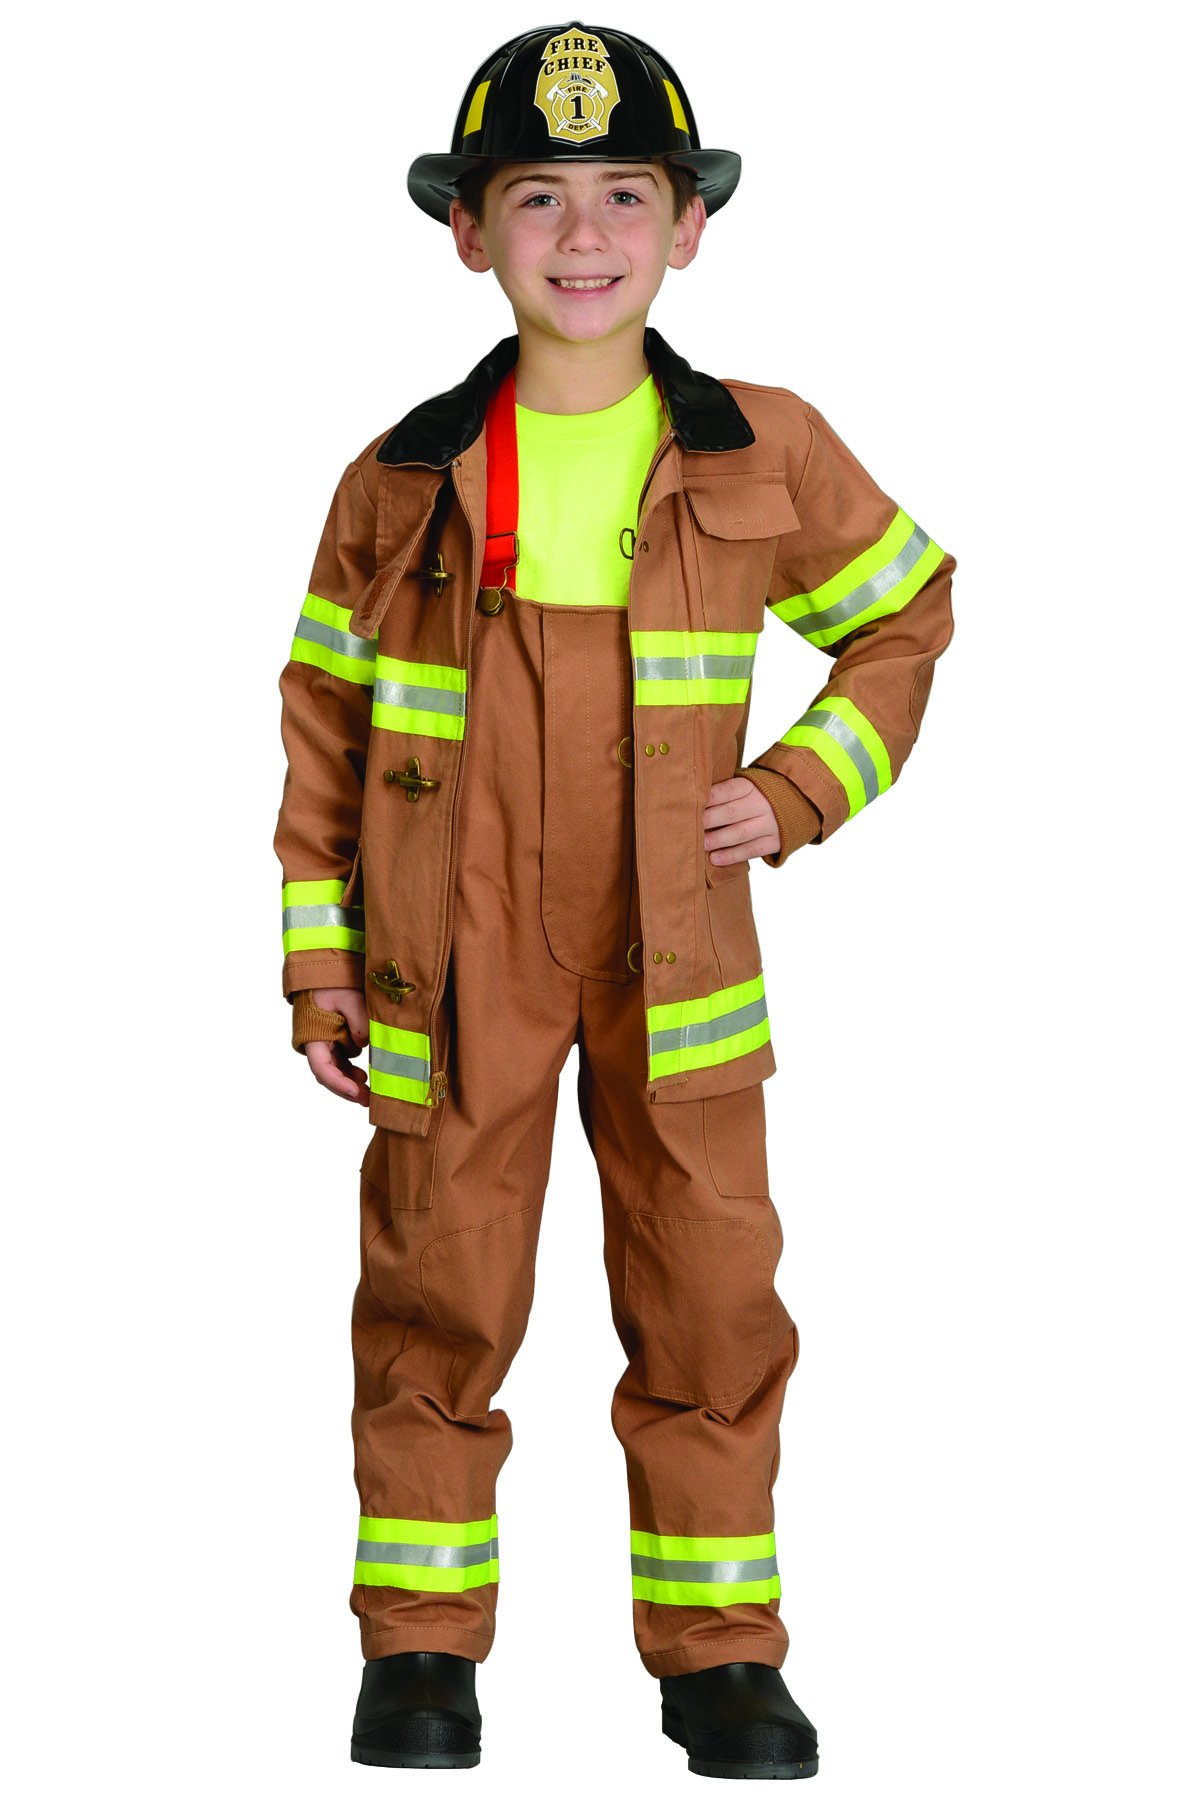 Jr. Fire Fighter Suit with helmet, size 6/8 (tan)